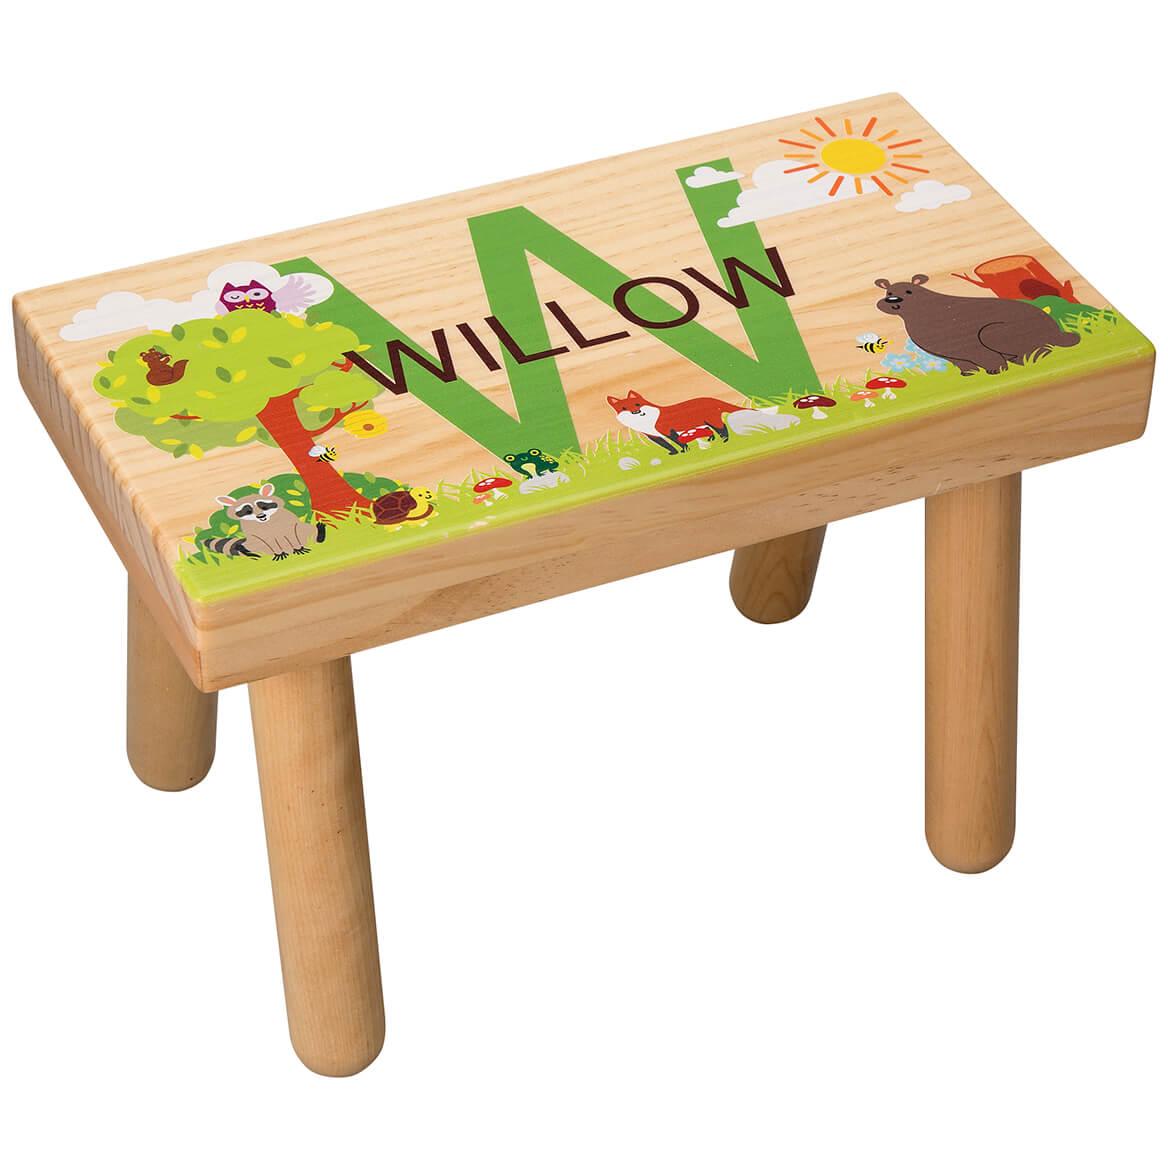 Personalized Woodland Animals Children's Step Stool-368055